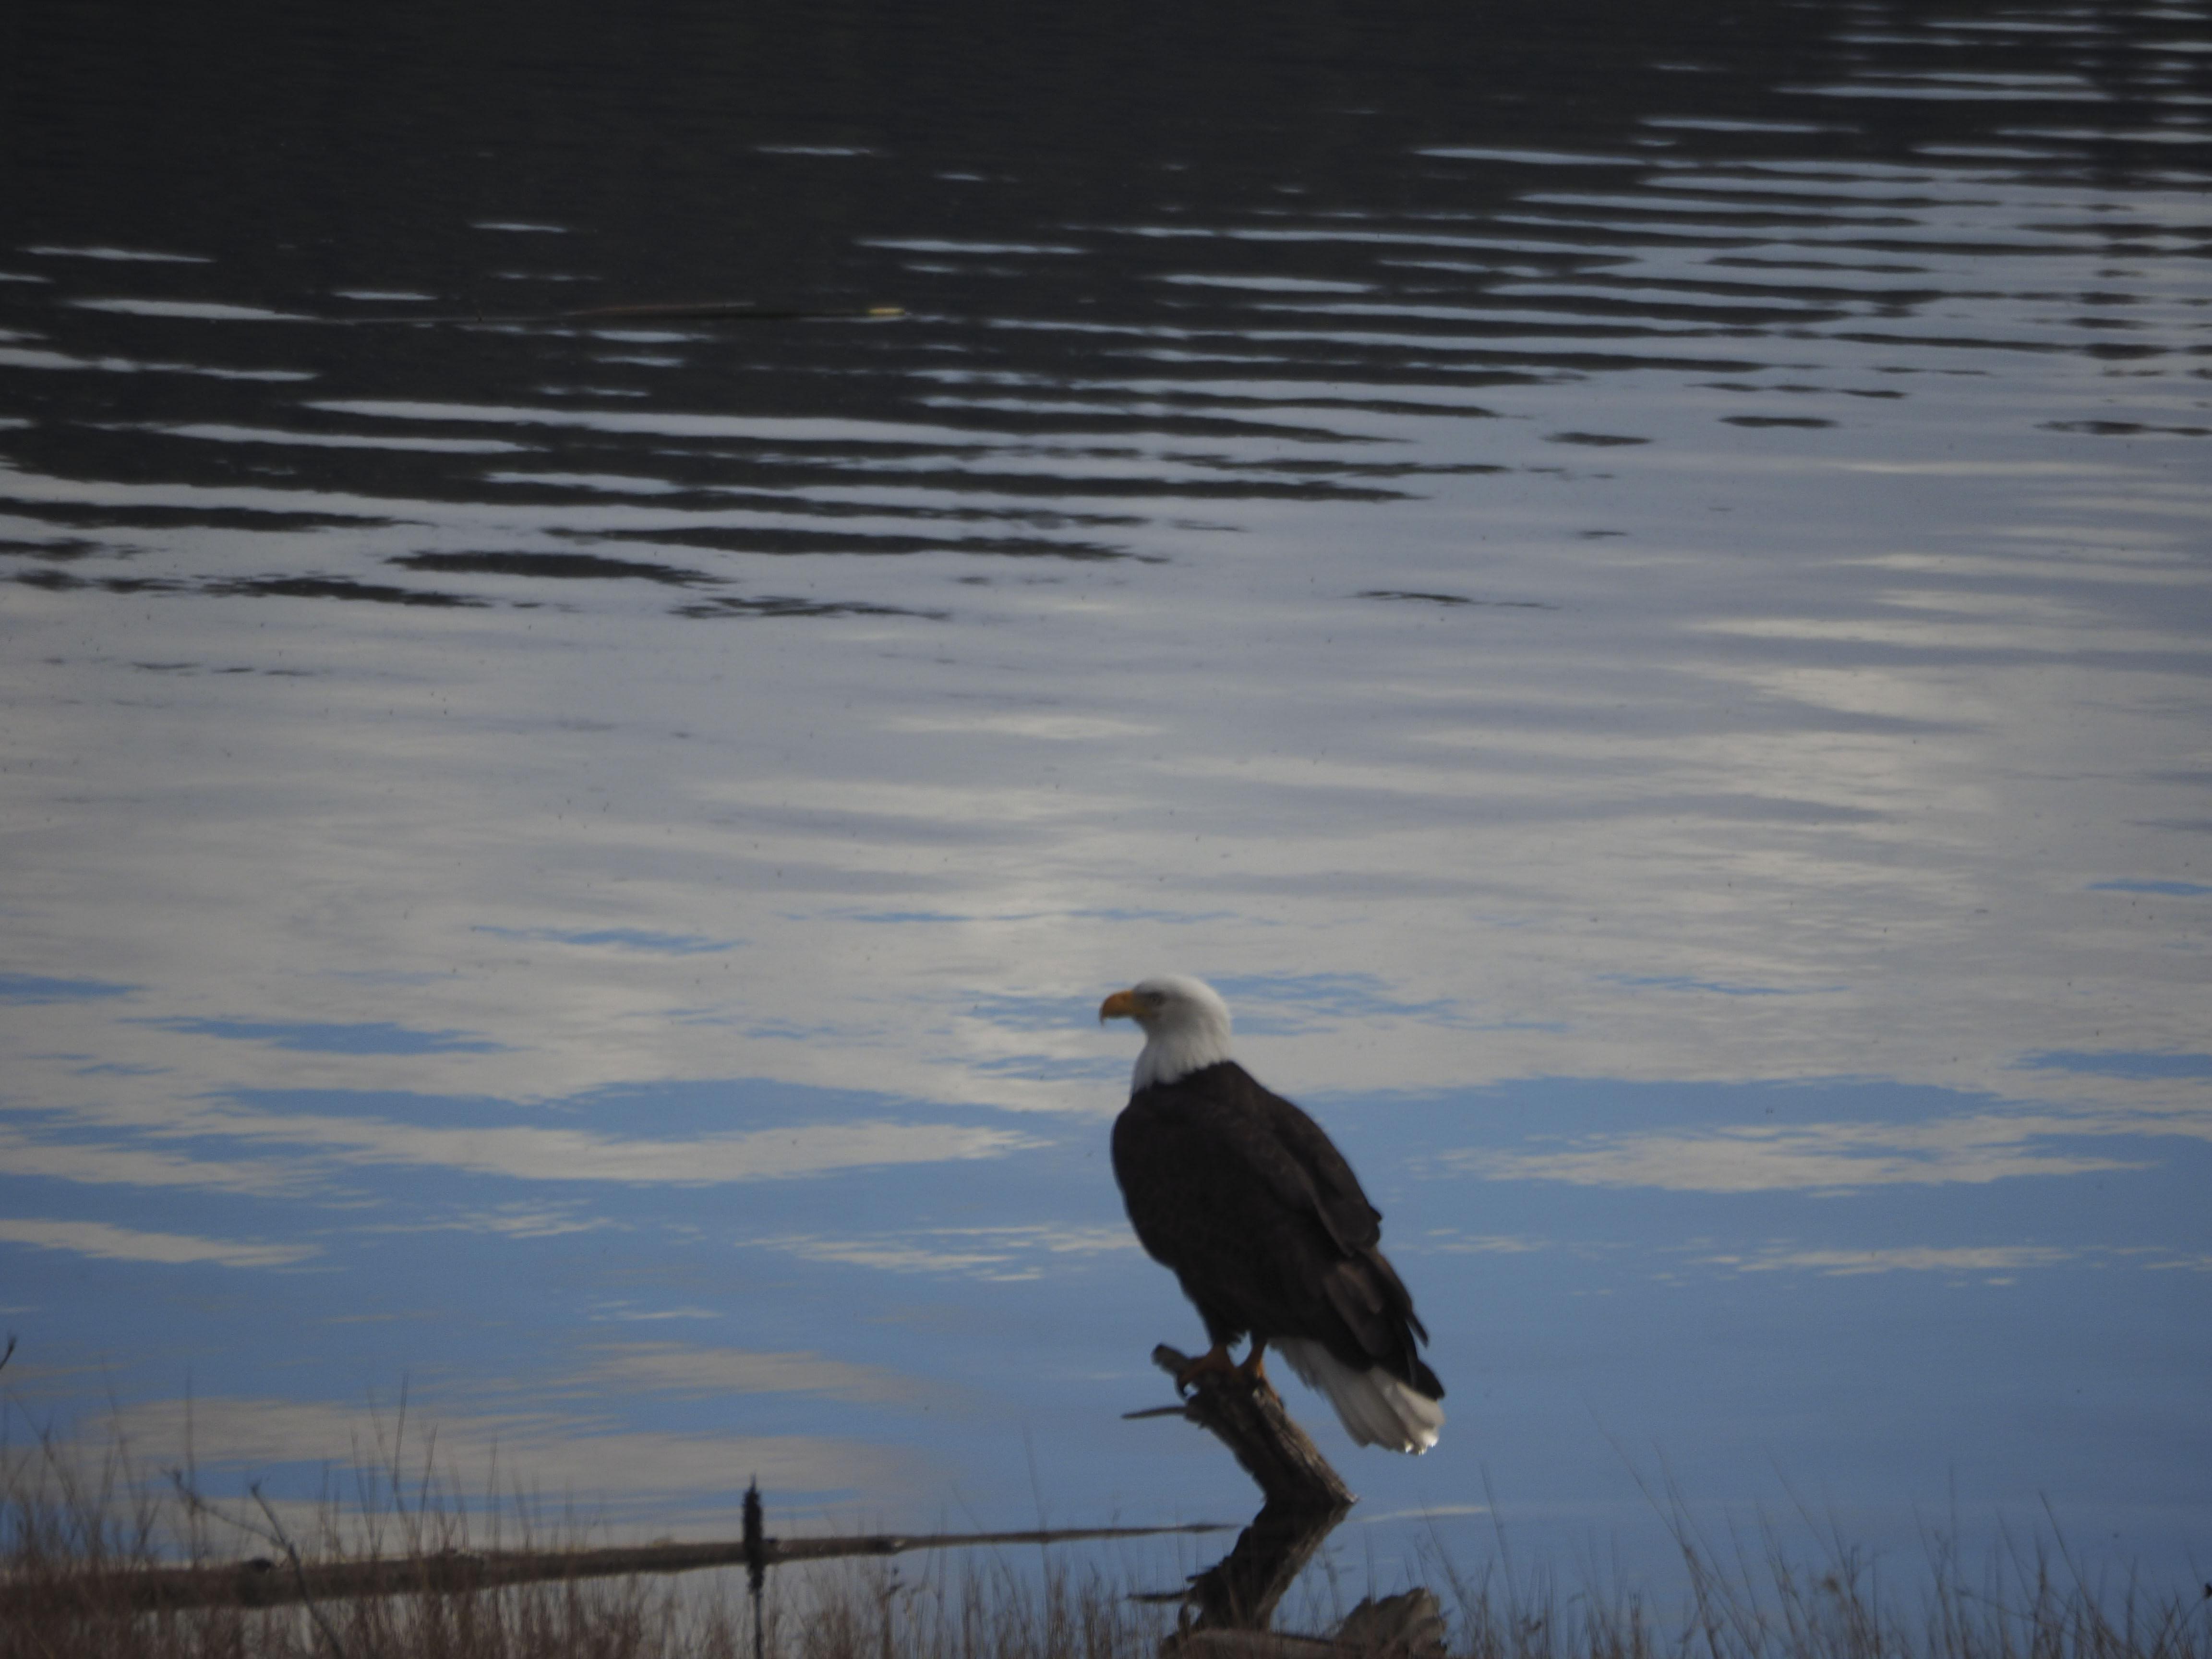 Bald Eagle Stump Lk -Kevin Haggkvist